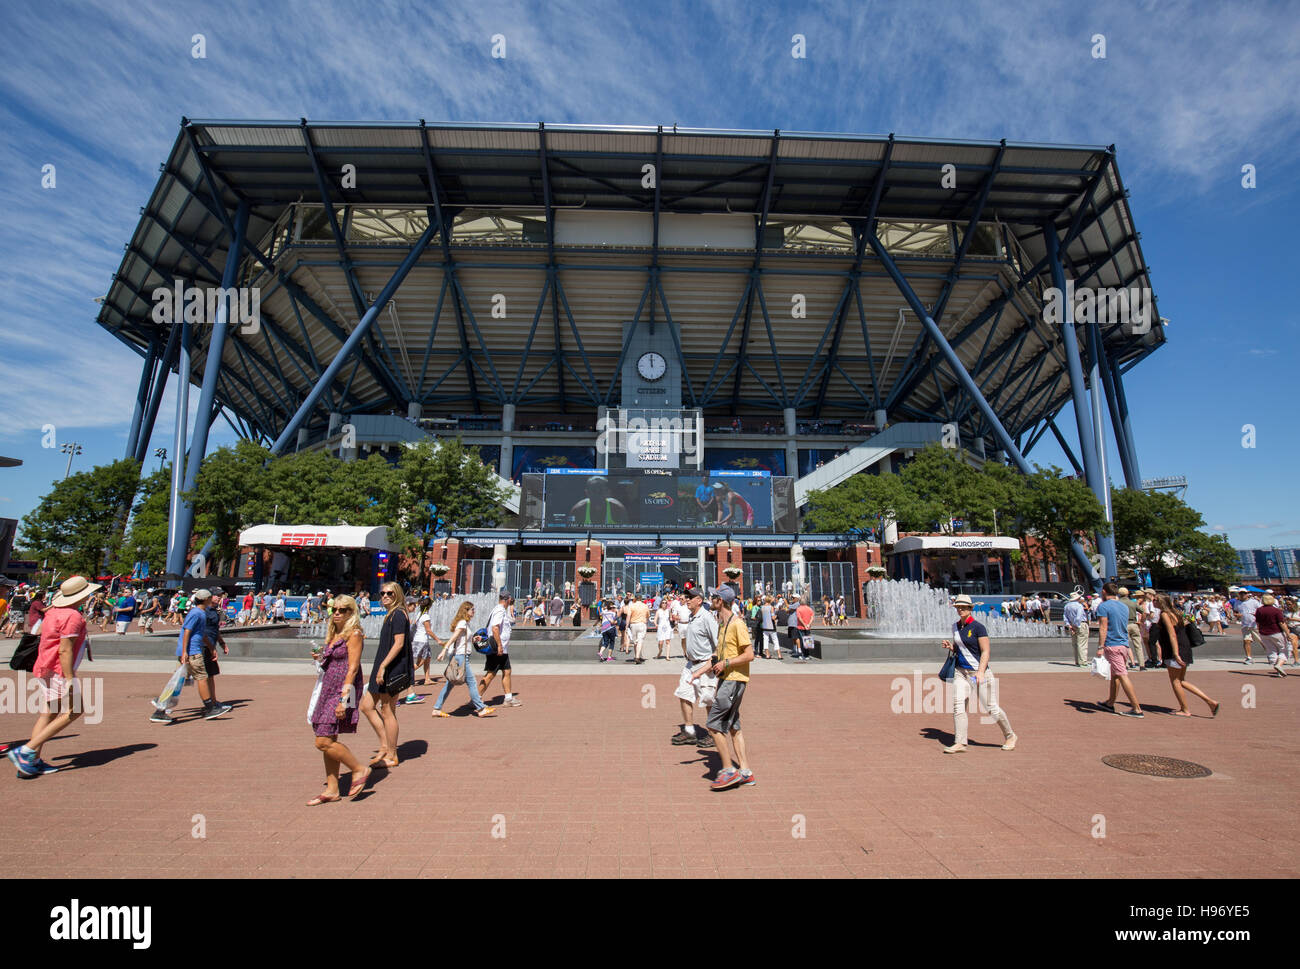 Arthur Ashe Stadium, US Open Championships 2016 - Stock Image